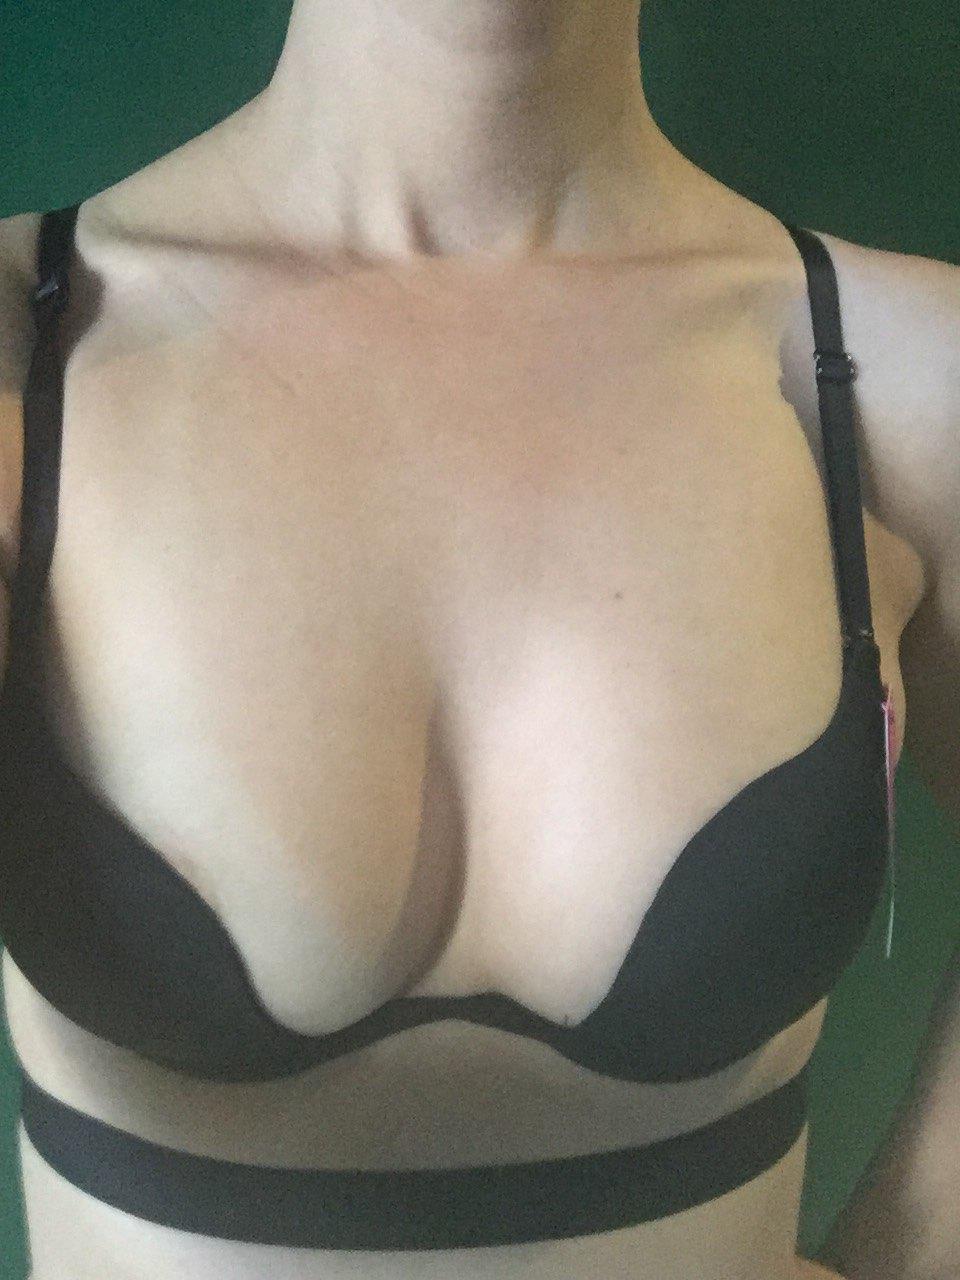 Sexy Women Lingerie U Backless Bras Underwear Deep U Low Cut Push Up Bra Intimates ECMLN Female Breathable Bralette deep u low cut u bra backlessu bra - AliExpress